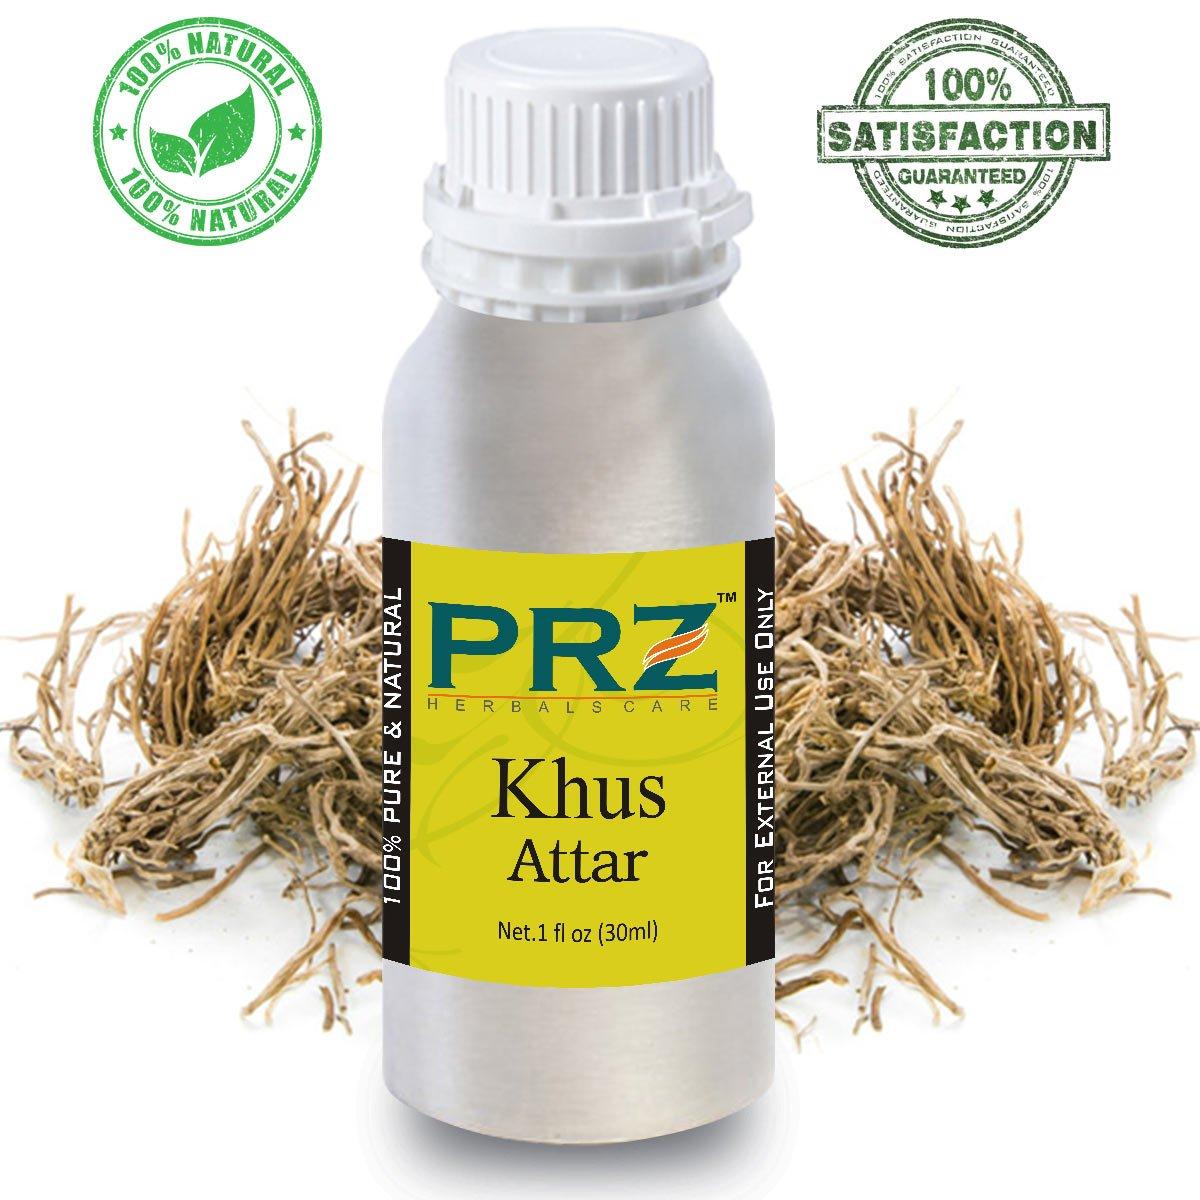 Prz Khus Attar For Unisex 100 Ml Pure Natural Premium Quality Gieve Original Body Oil Perfume Non Alcoholic Beauty